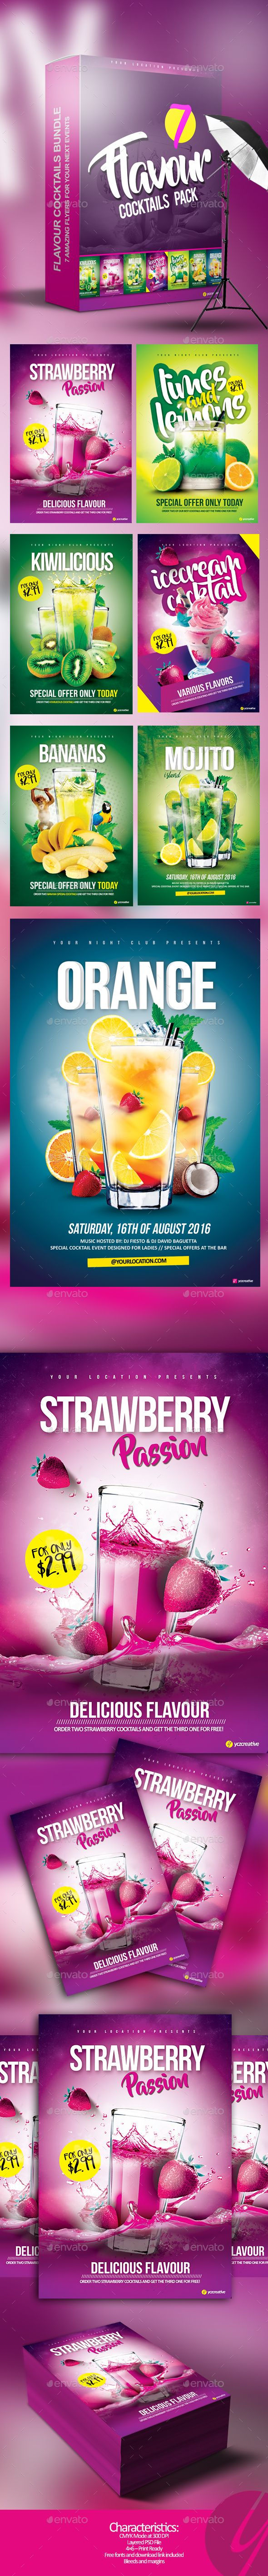 Flavour Cocktails Pack  — PSD Template #vodka #club • Download ➝ https://graphicriver.net/item/flavour-cocktails-pack/18194312?ref=pxcr